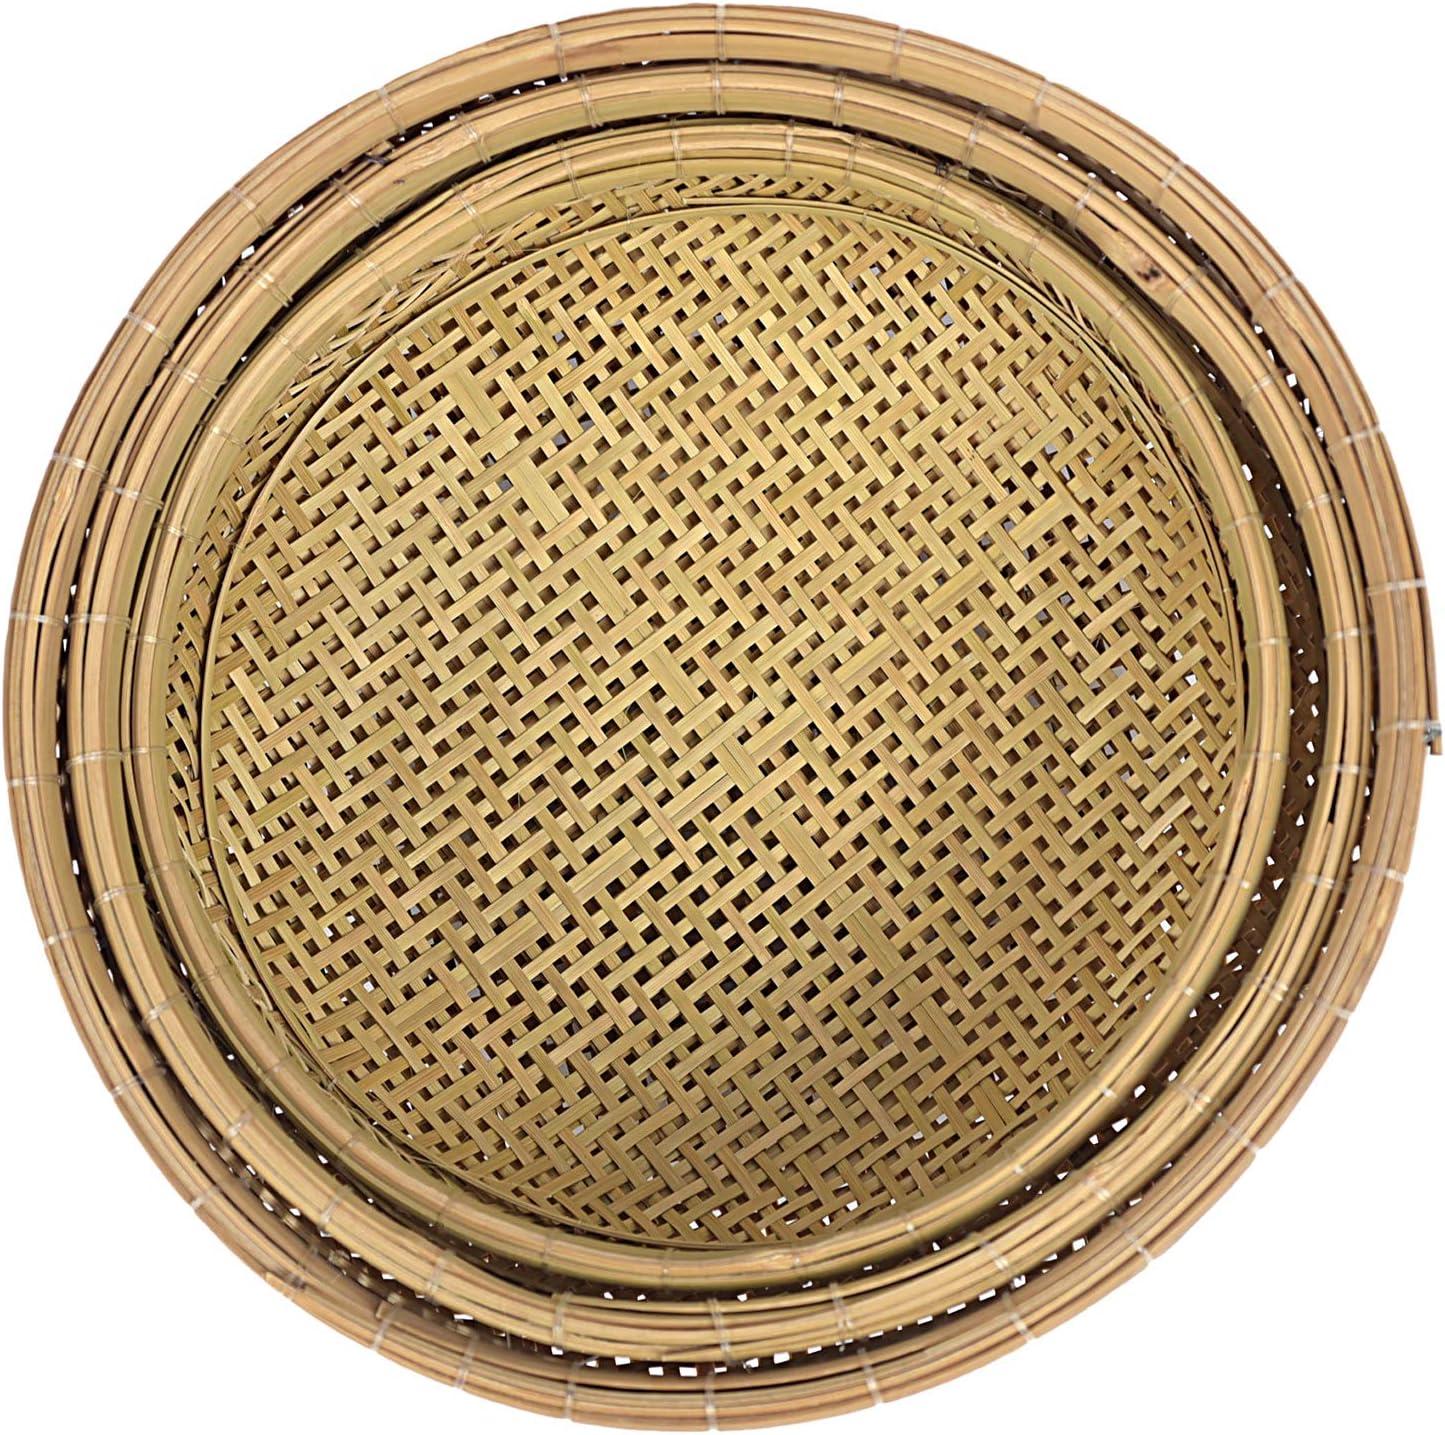 Equeen Handicraft Bamboo Round Wicker Max 76% OFF for Baskets Wa organizing Super intense SALE